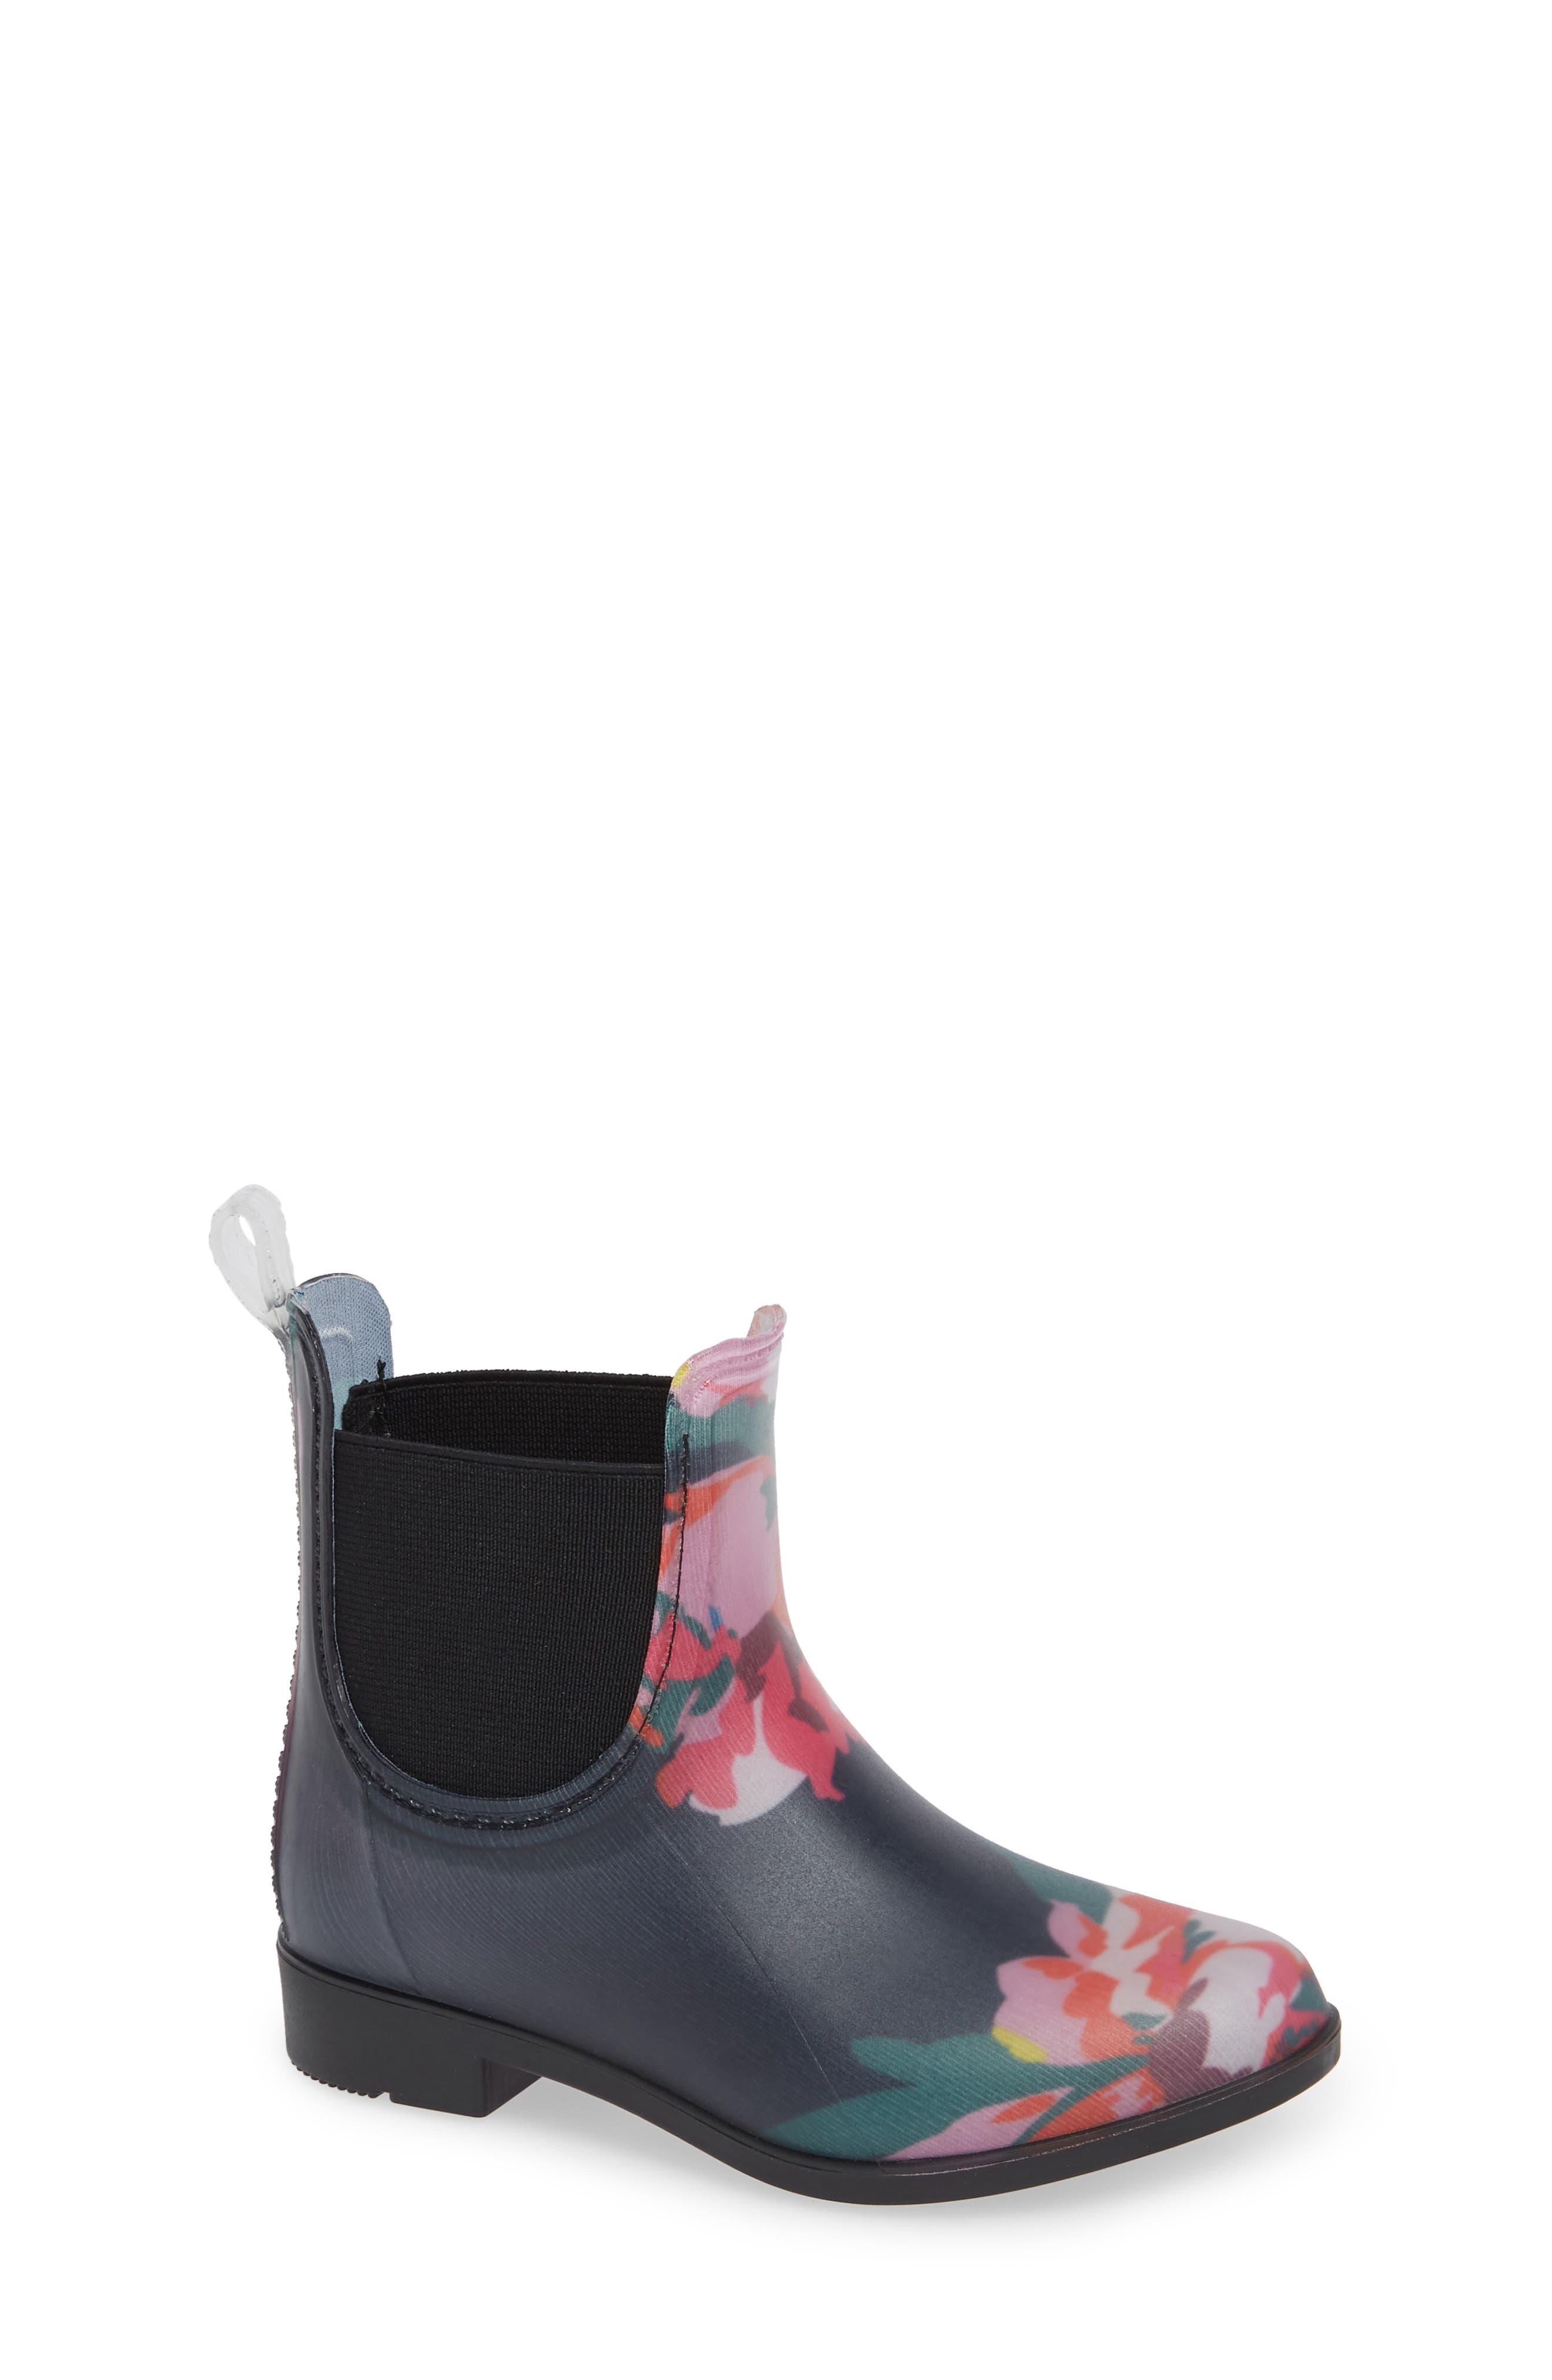 Chelsea Rain Boot, Main, color, NAVY GRANNY FLORAL